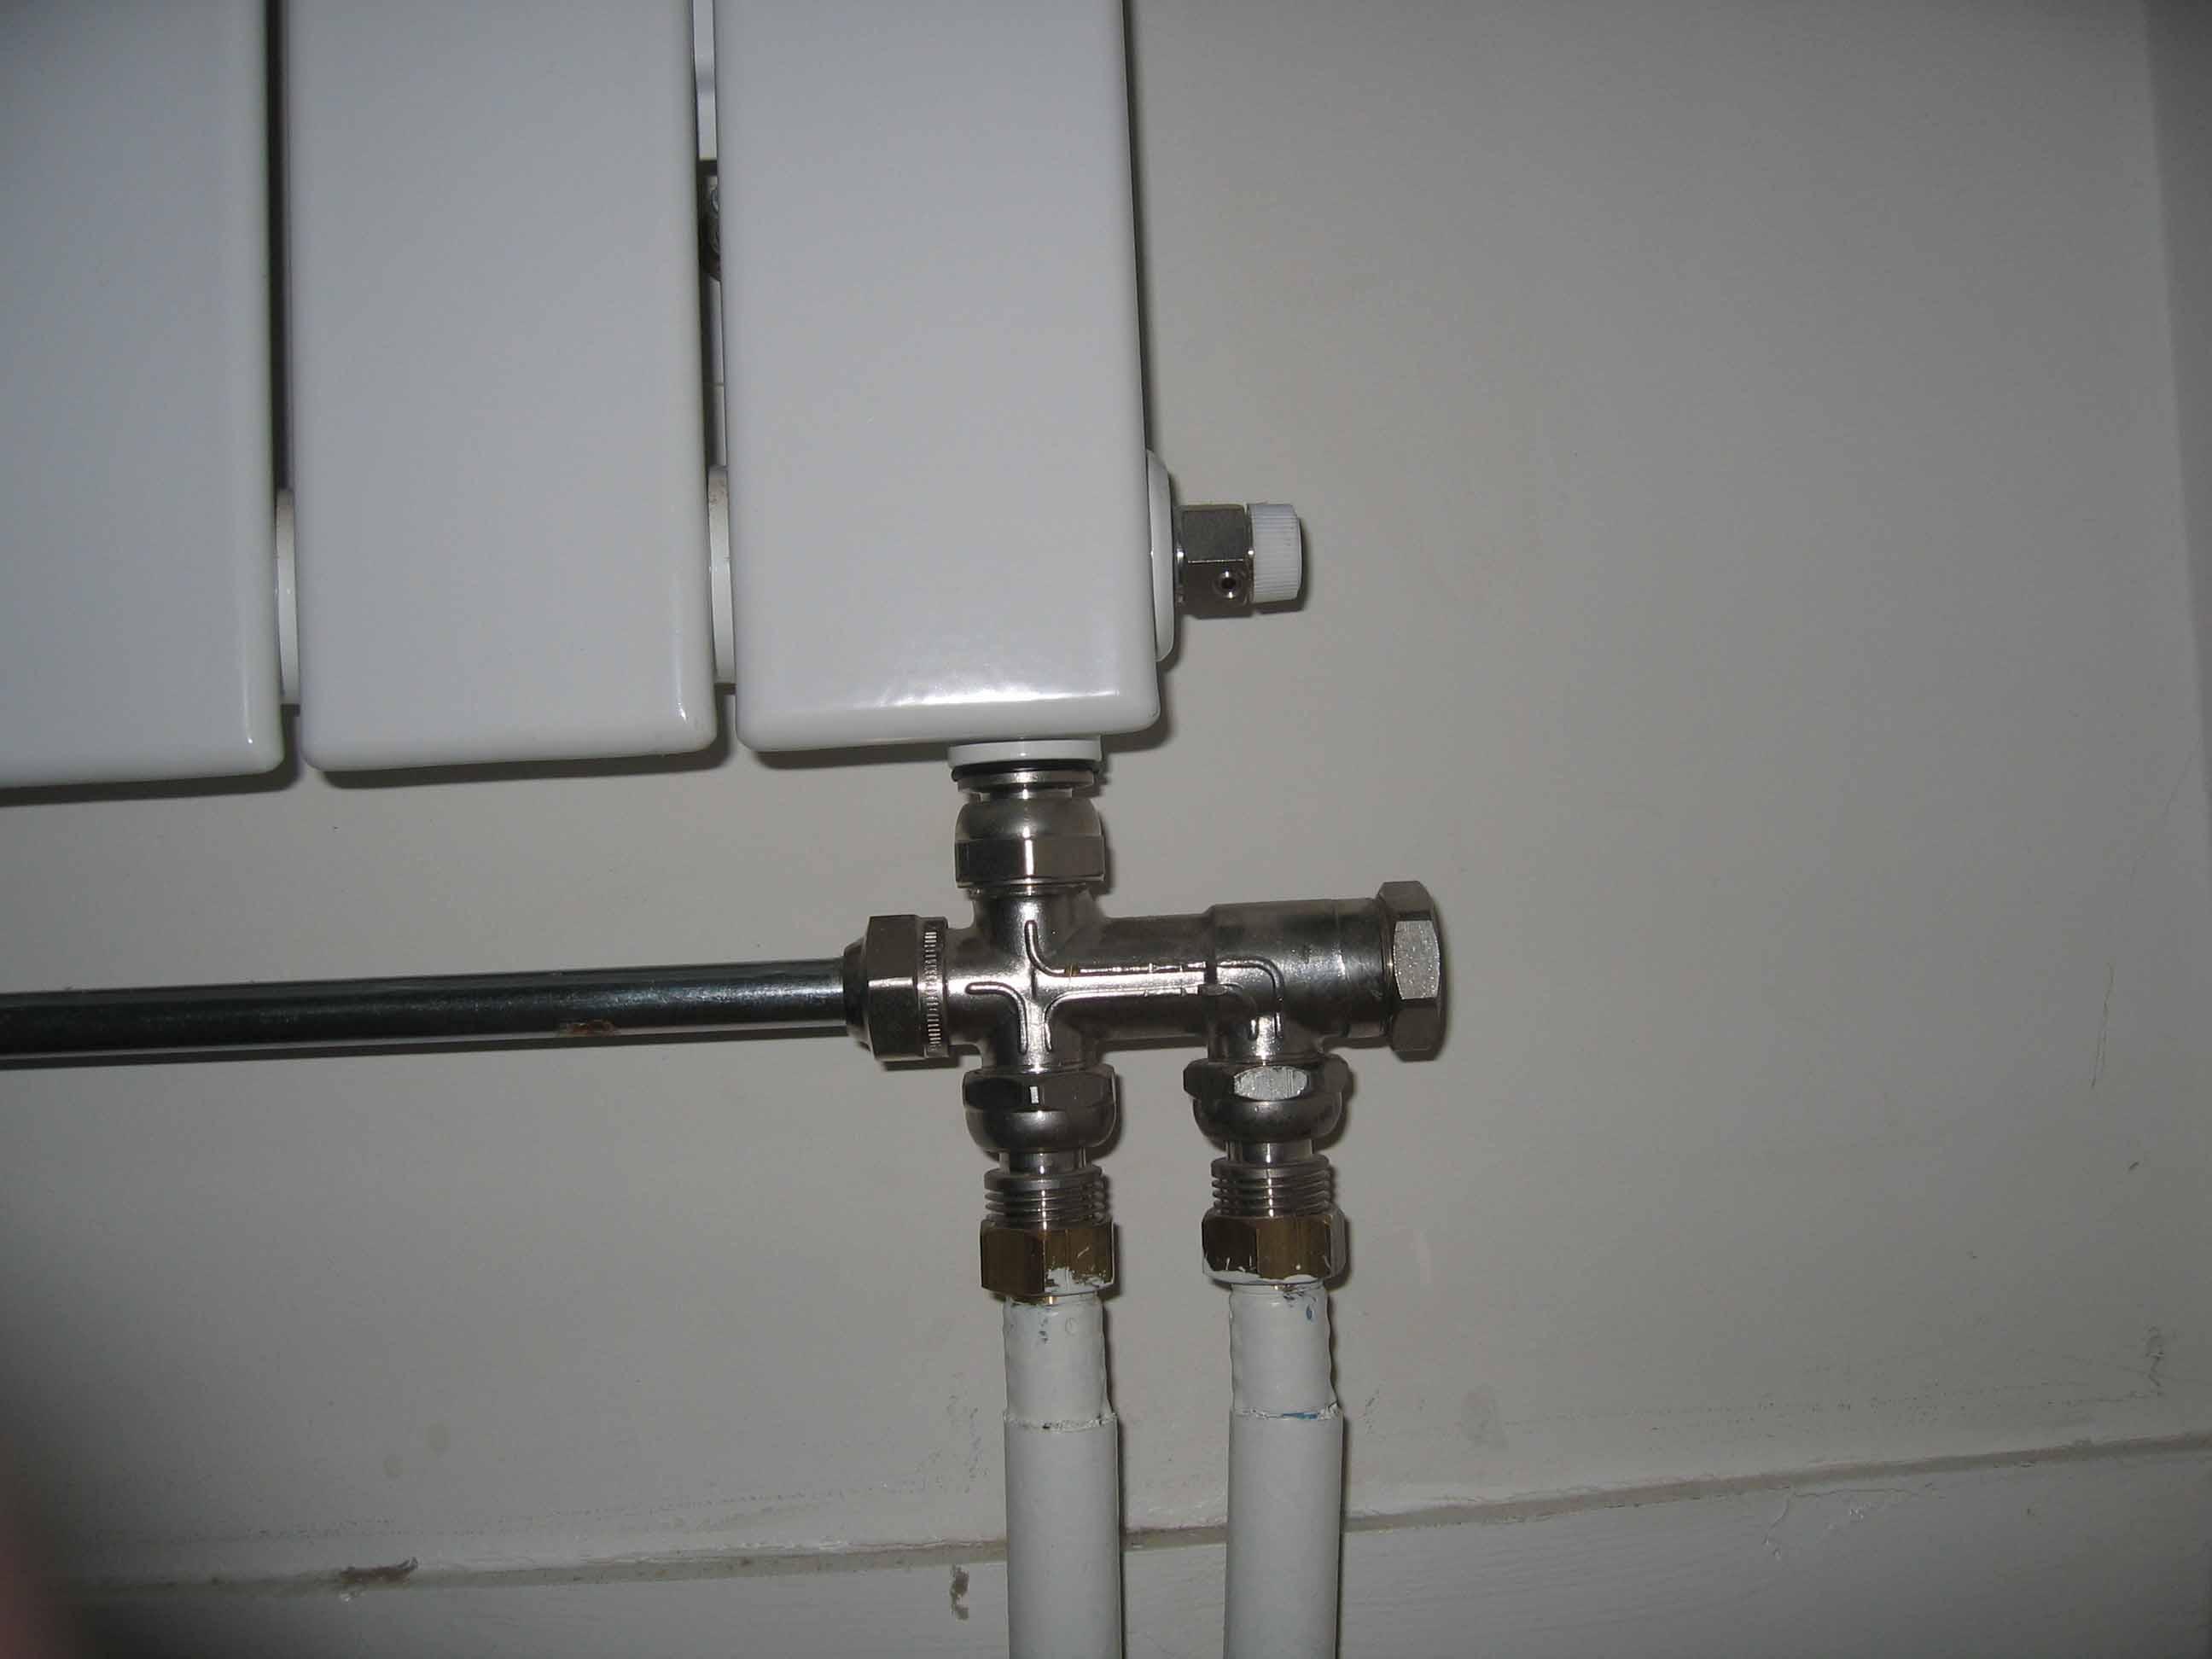 Raccordement de radiateur monotube for Changer robinet thermostatique radiateur